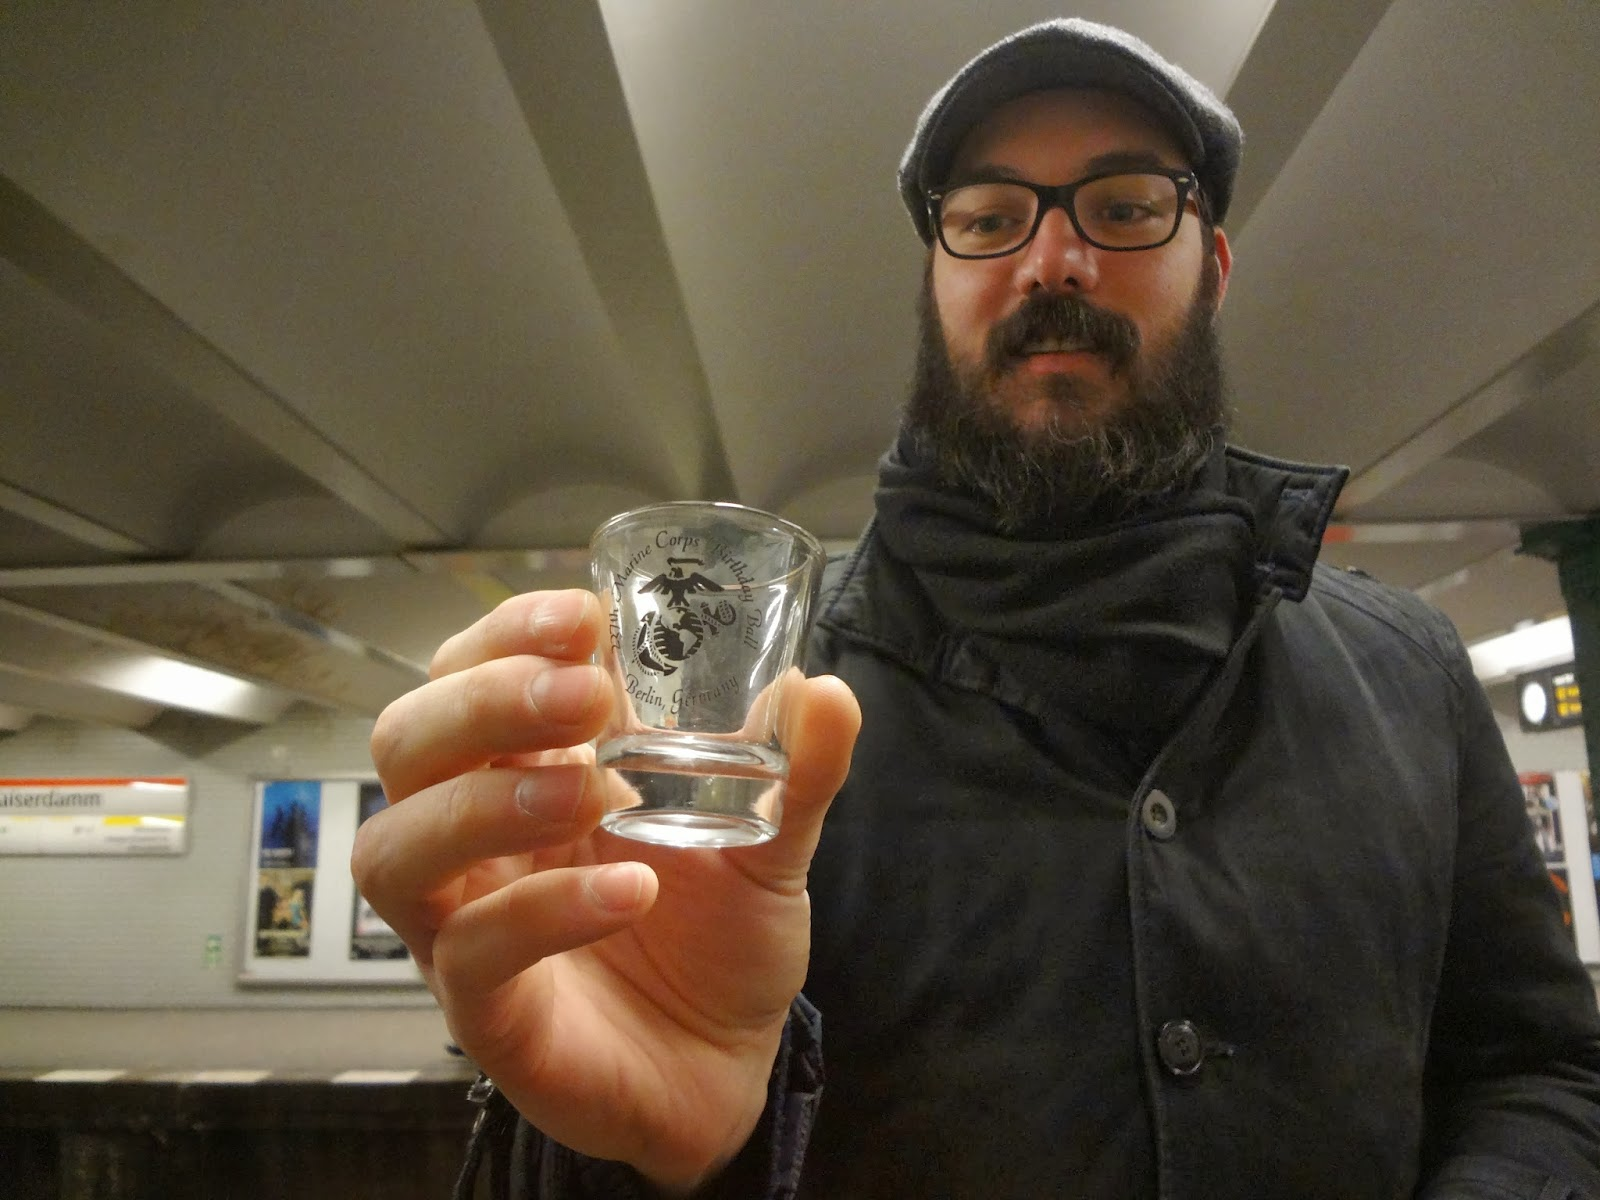 Drinking tour of the Berlin UBahn